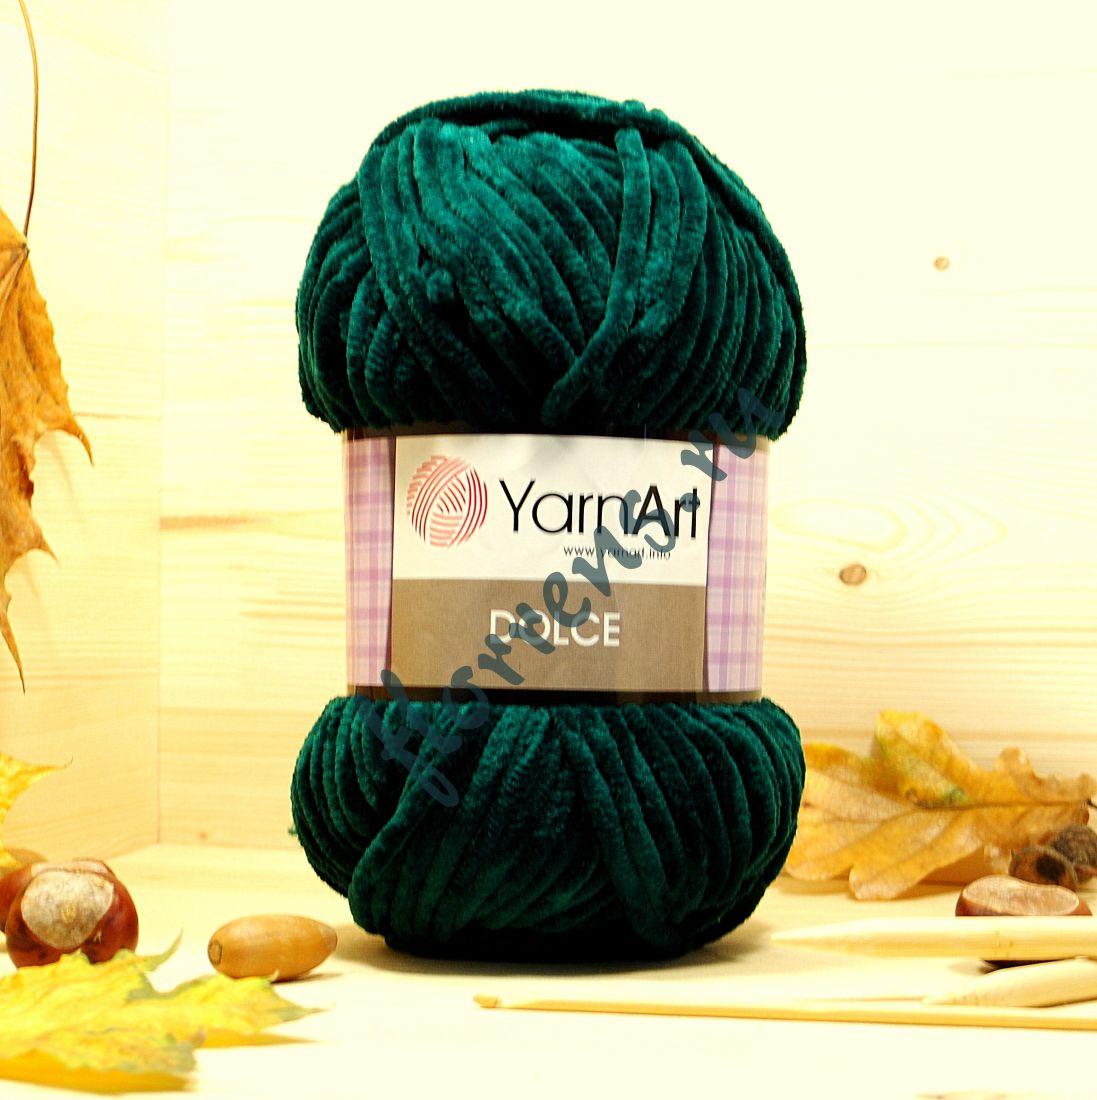 Пряжа YarnArt Dolce / 774 изумрудный